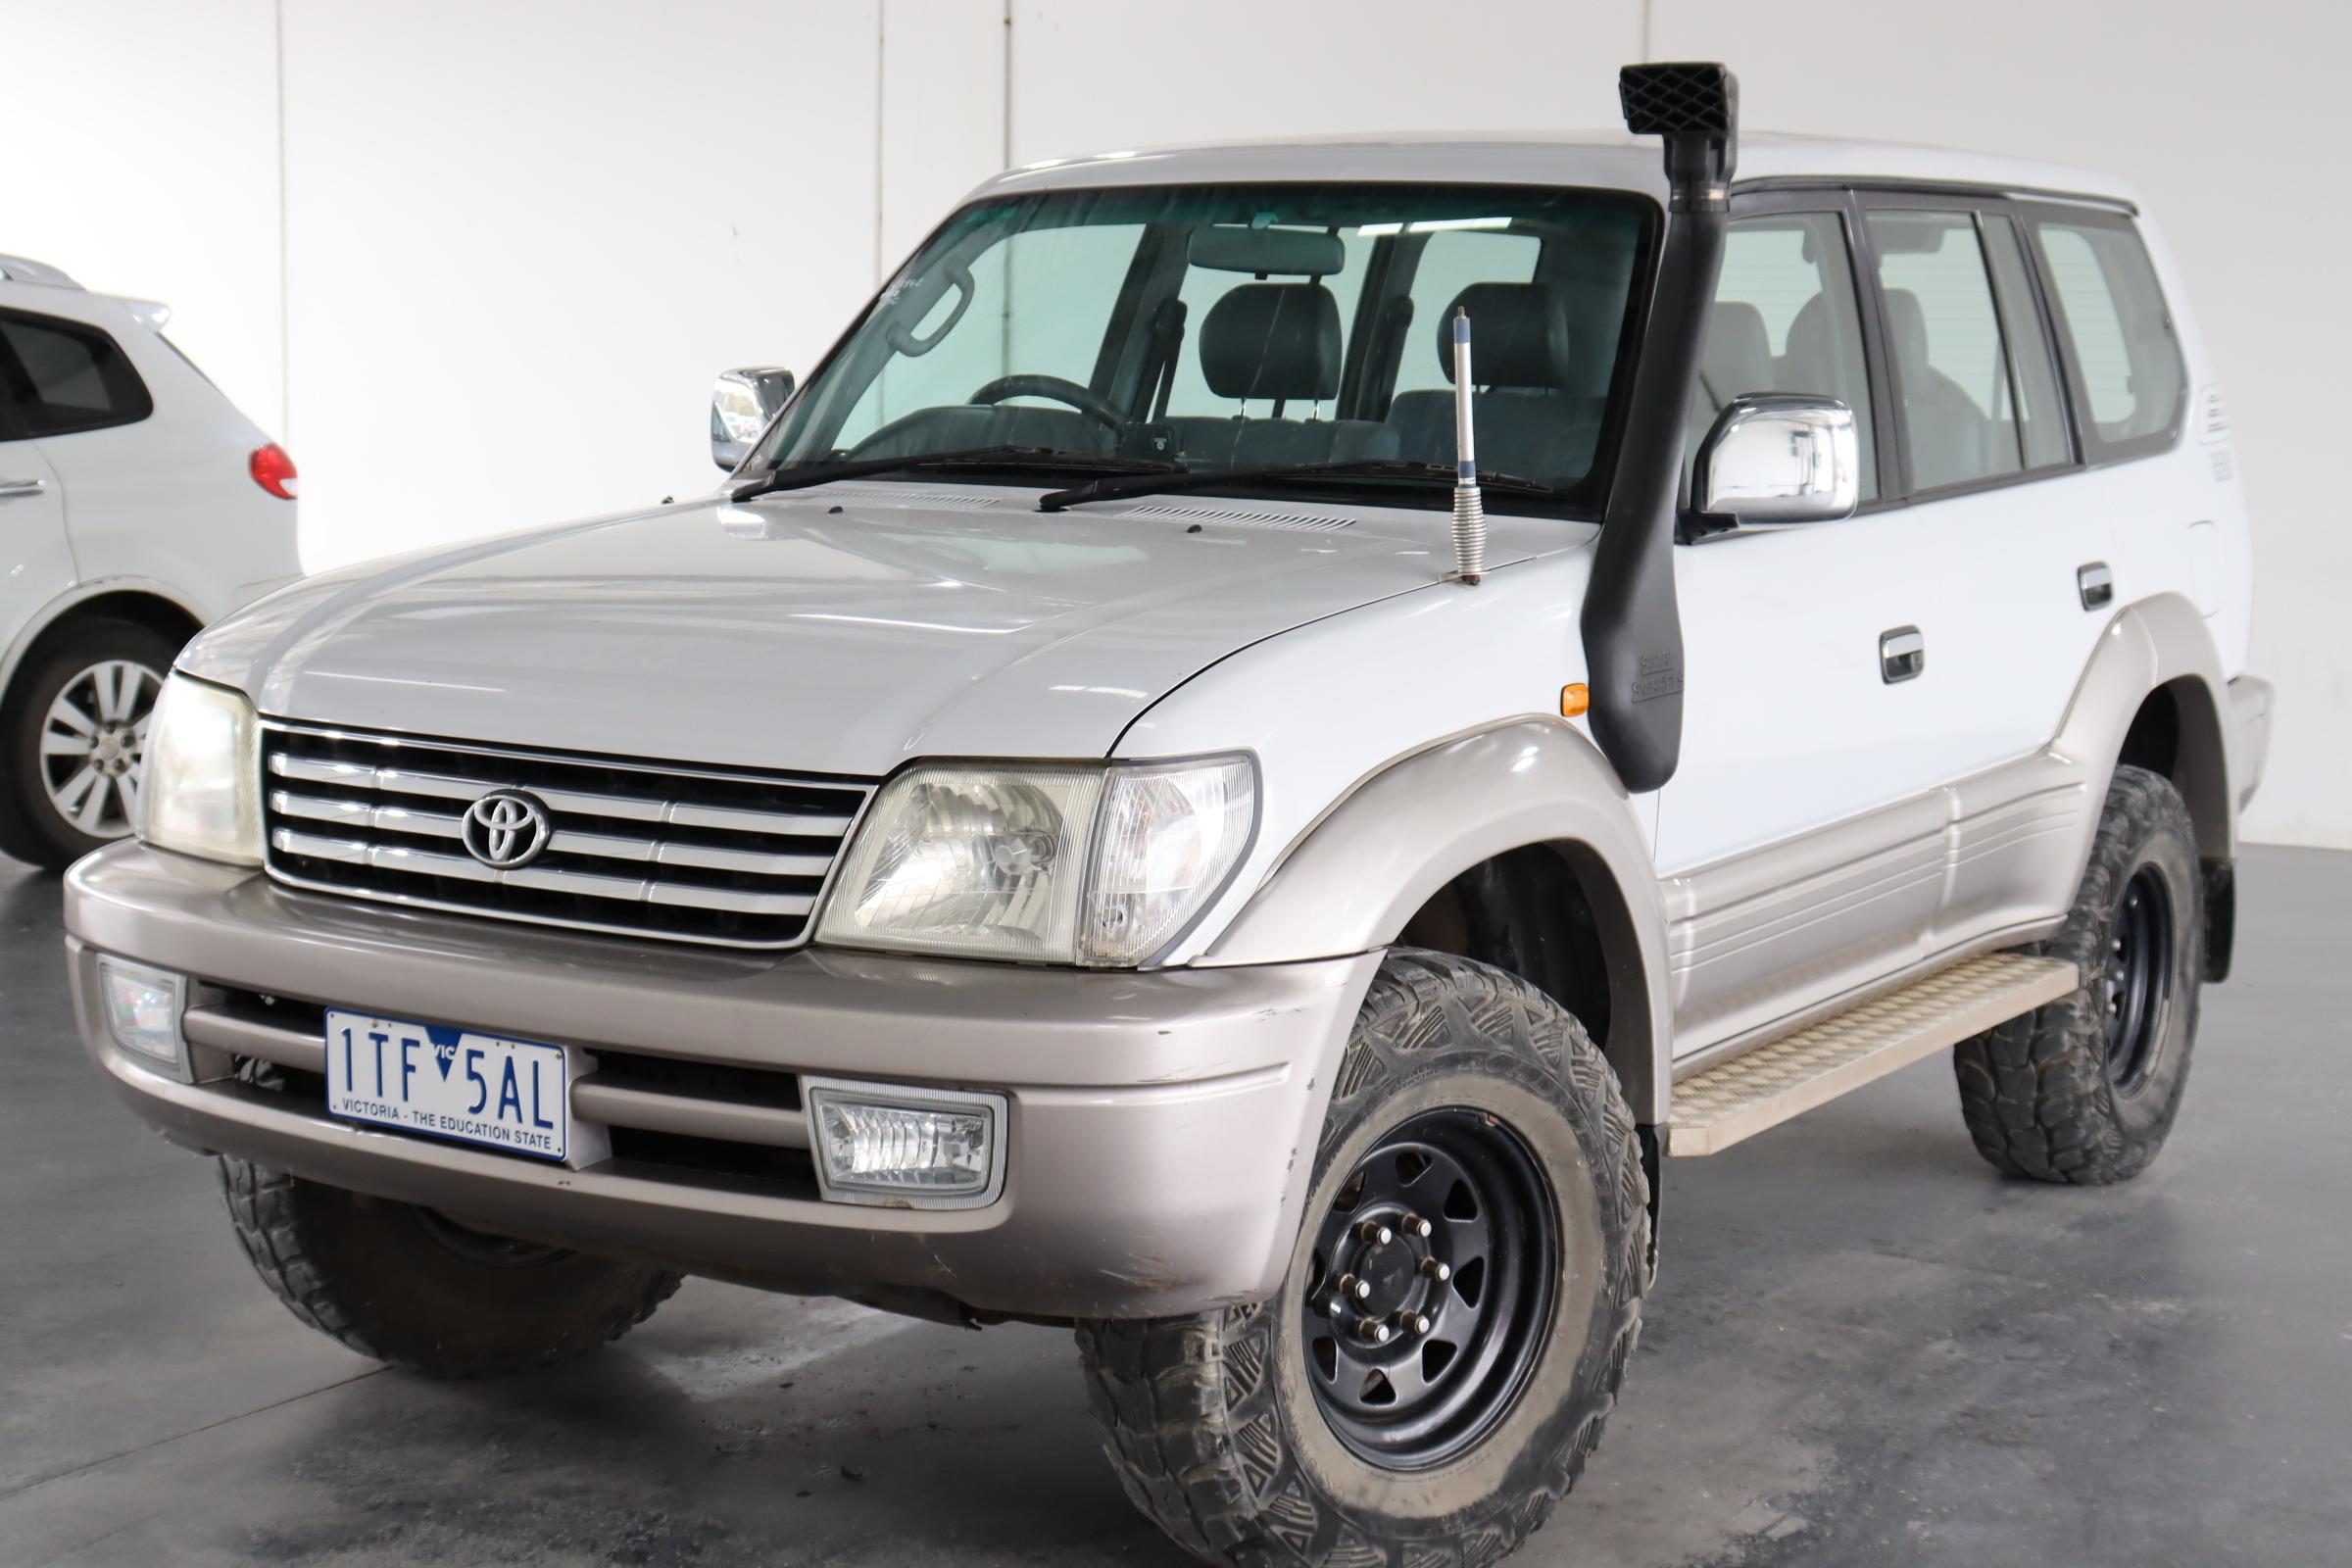 2002 Toyota Landcruiser Manual 8 Seats Suv